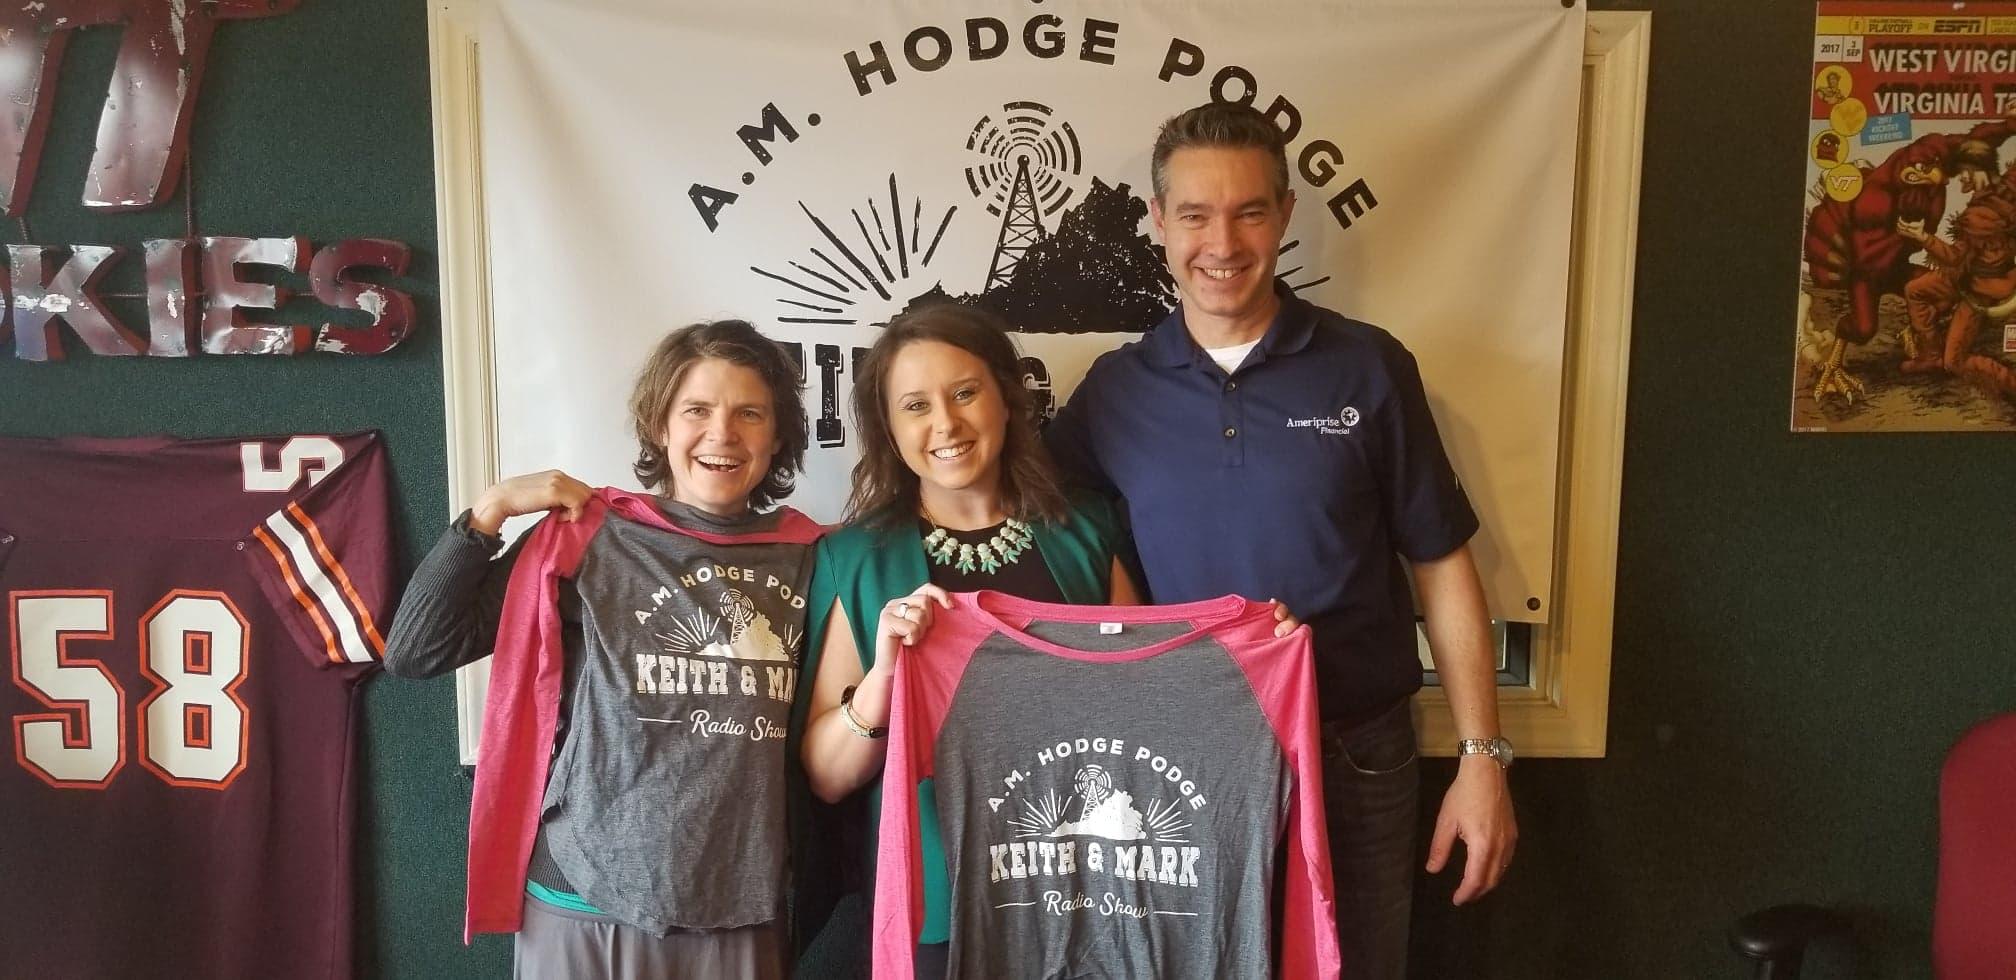 AM Hodgepodge 03-14-20 Woods Hole Hostel and Mountain B&B